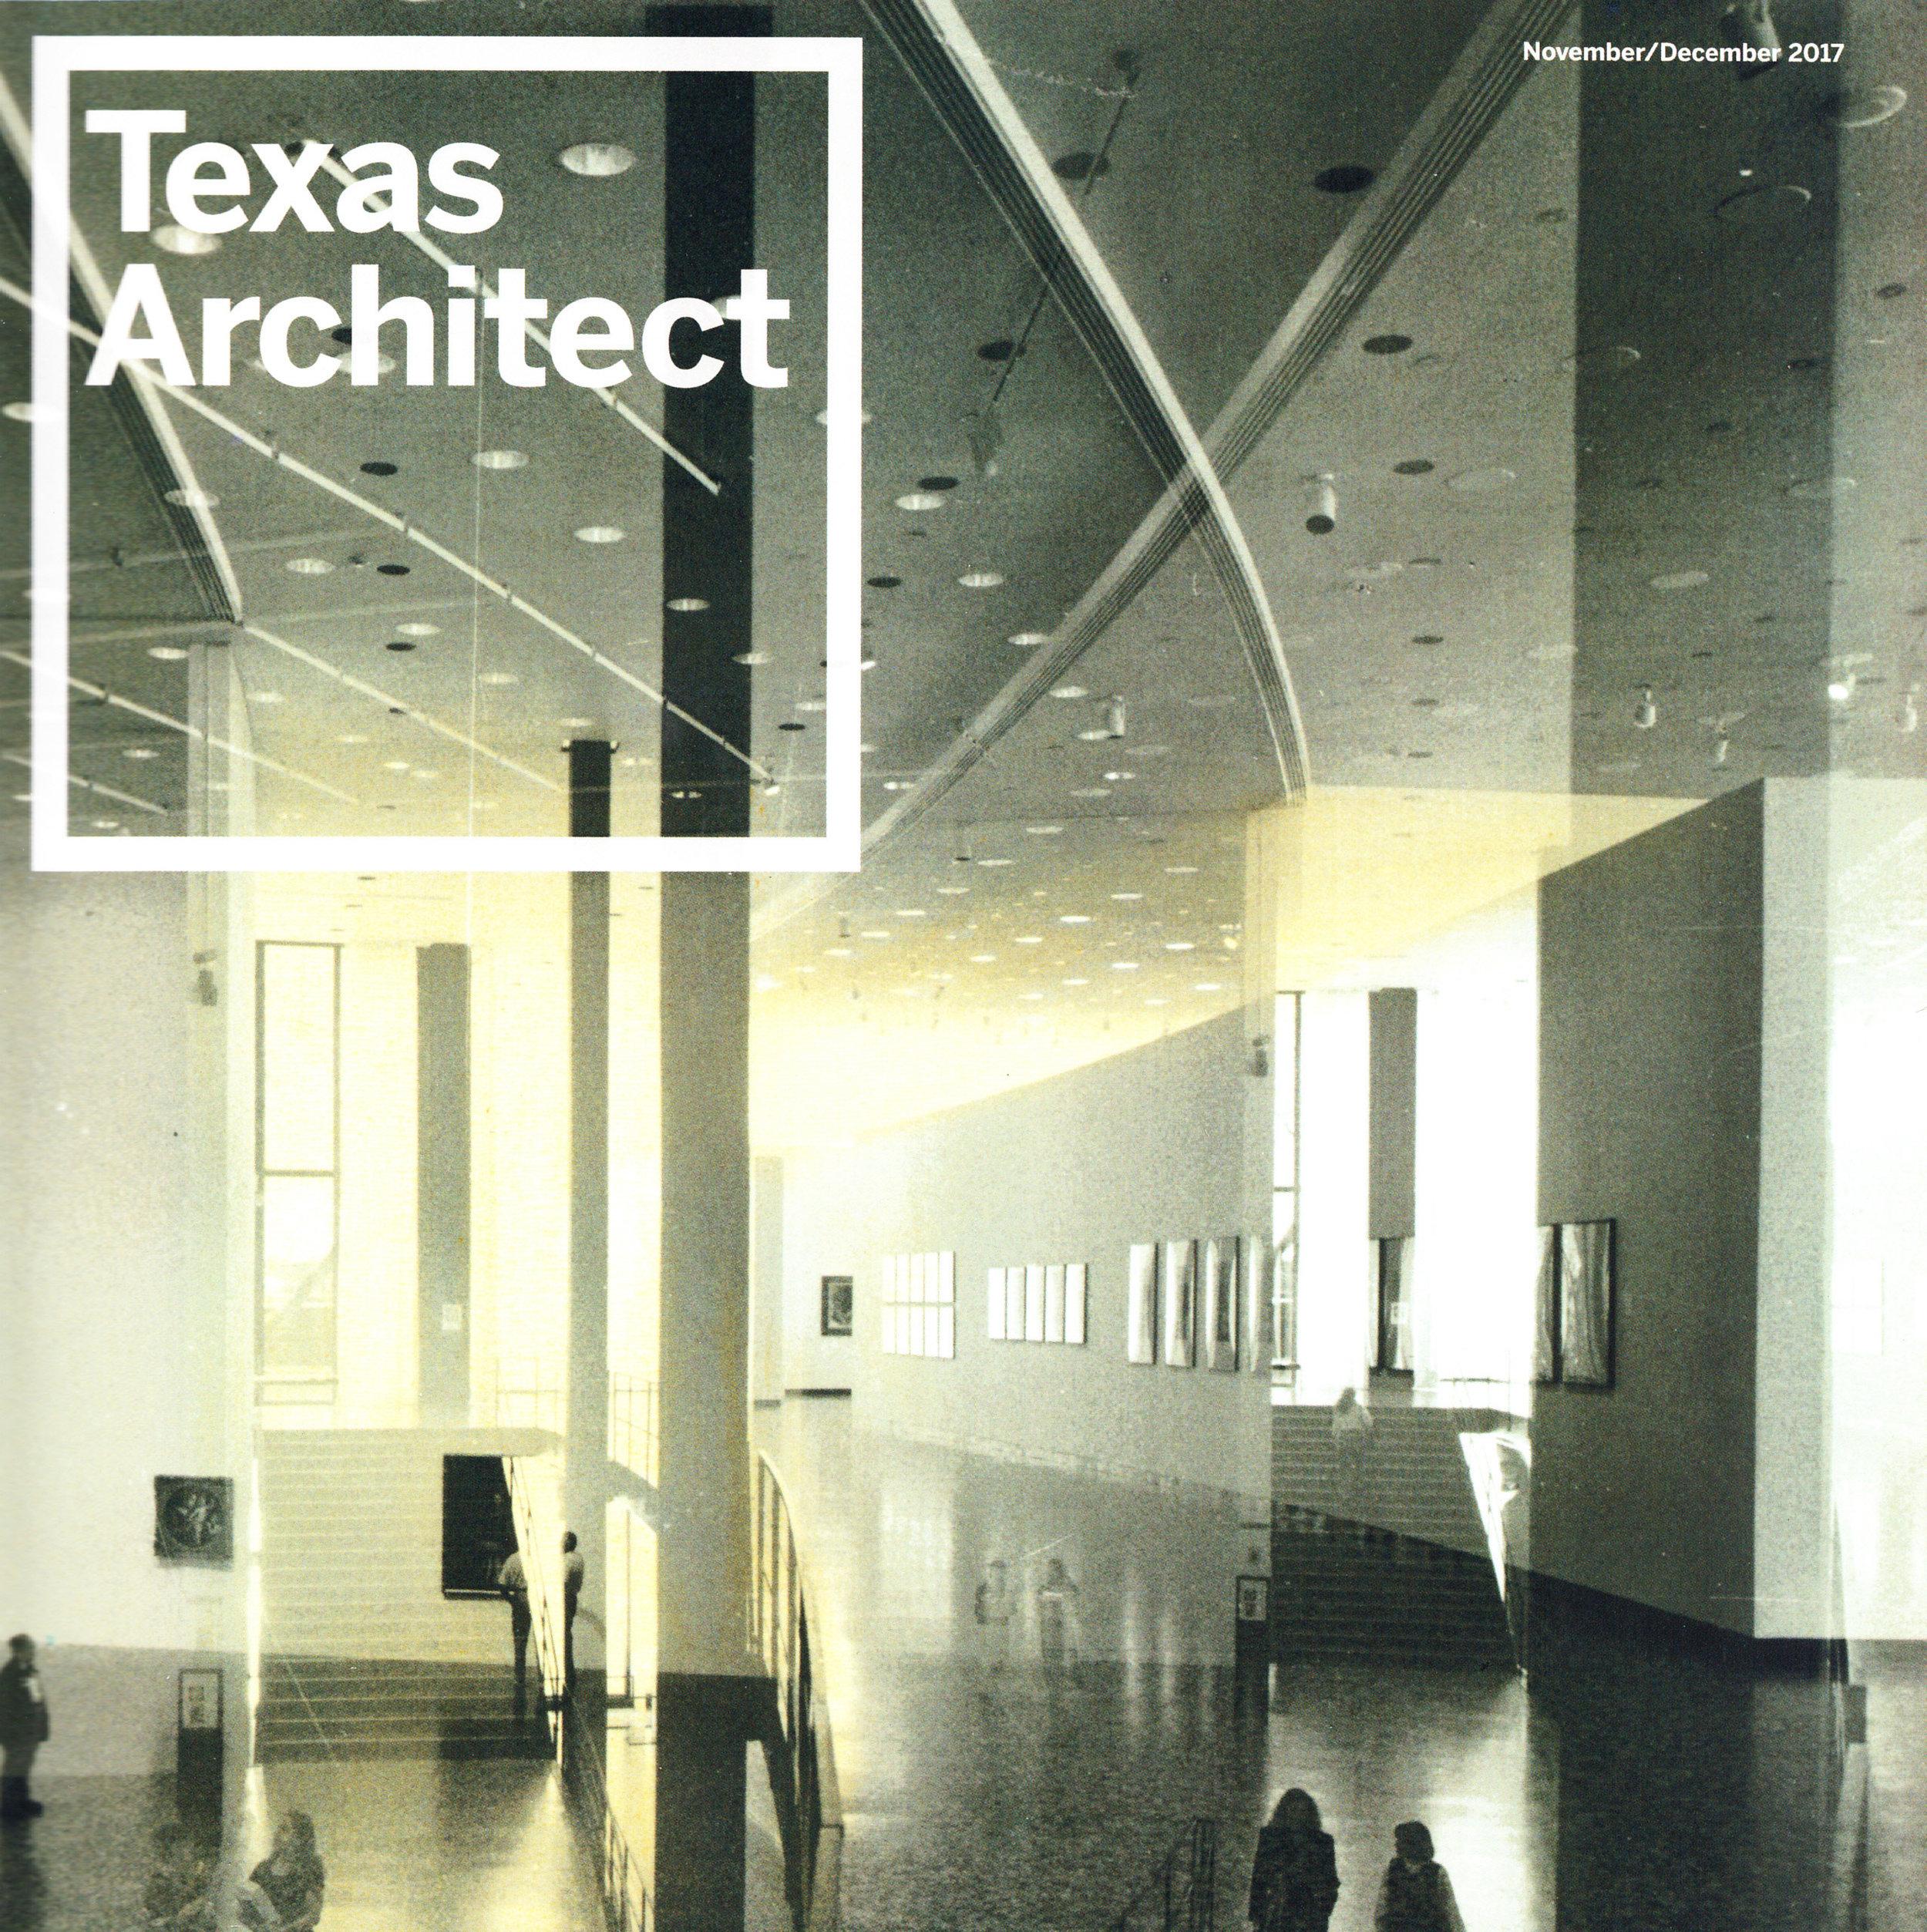 2017_11_Texas Architect_cover.jpg